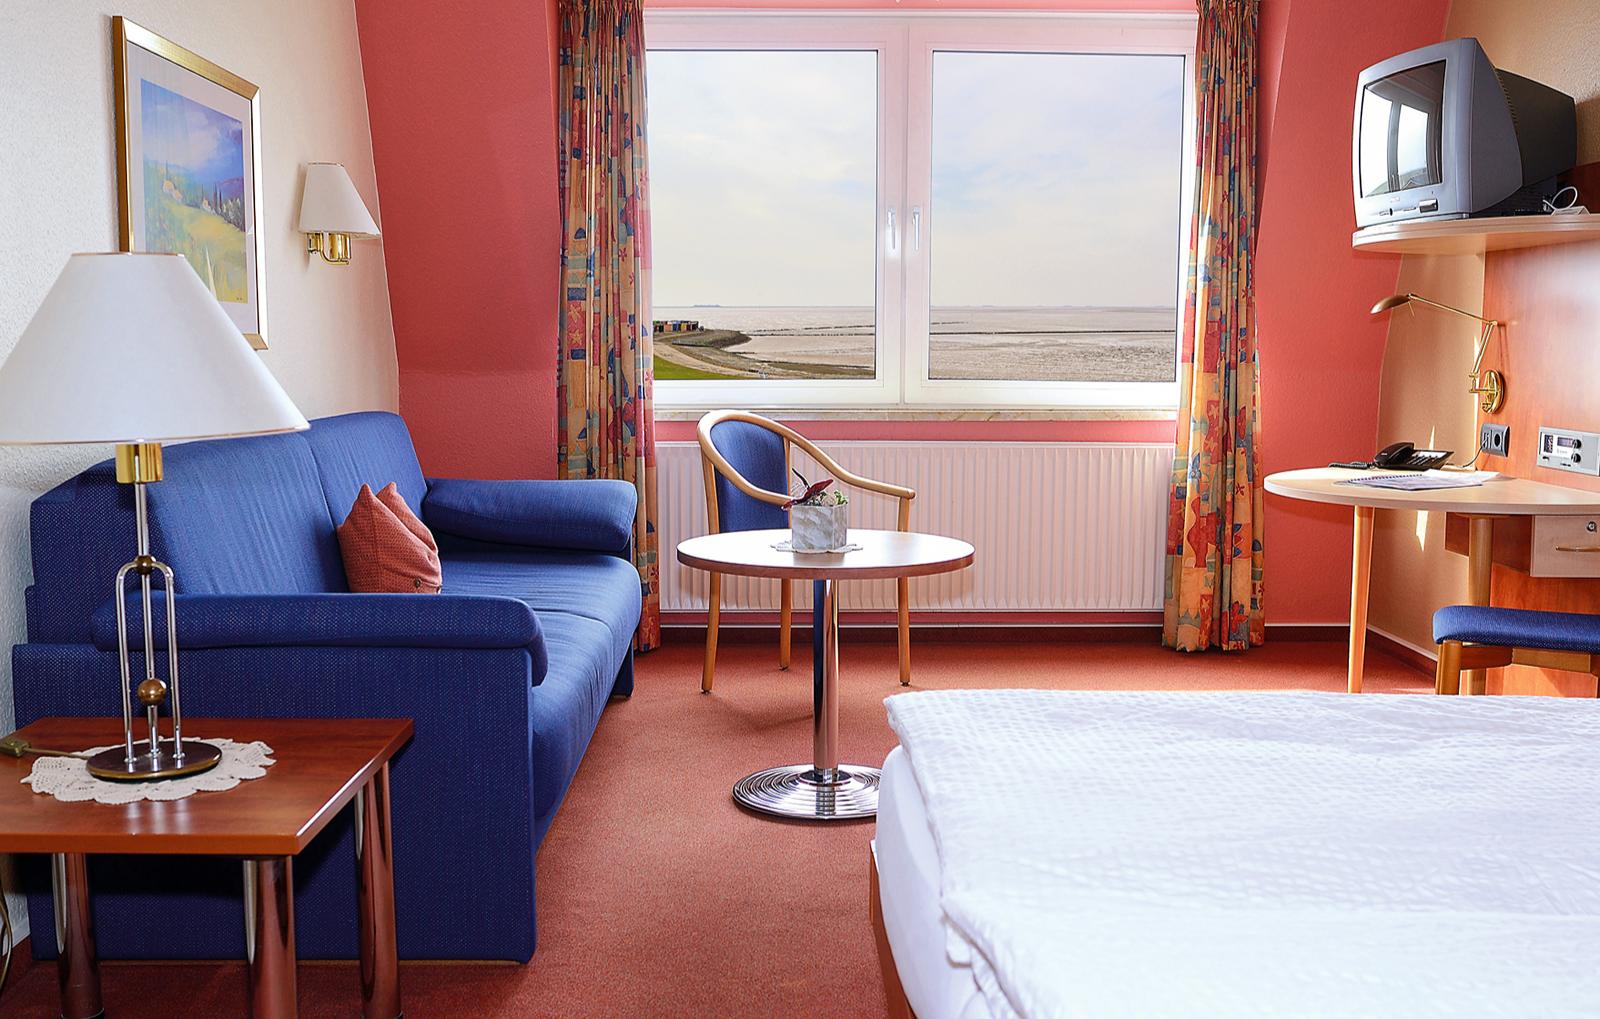 einfach-mal-urlaub-strandhotel-dagebuell-bg2